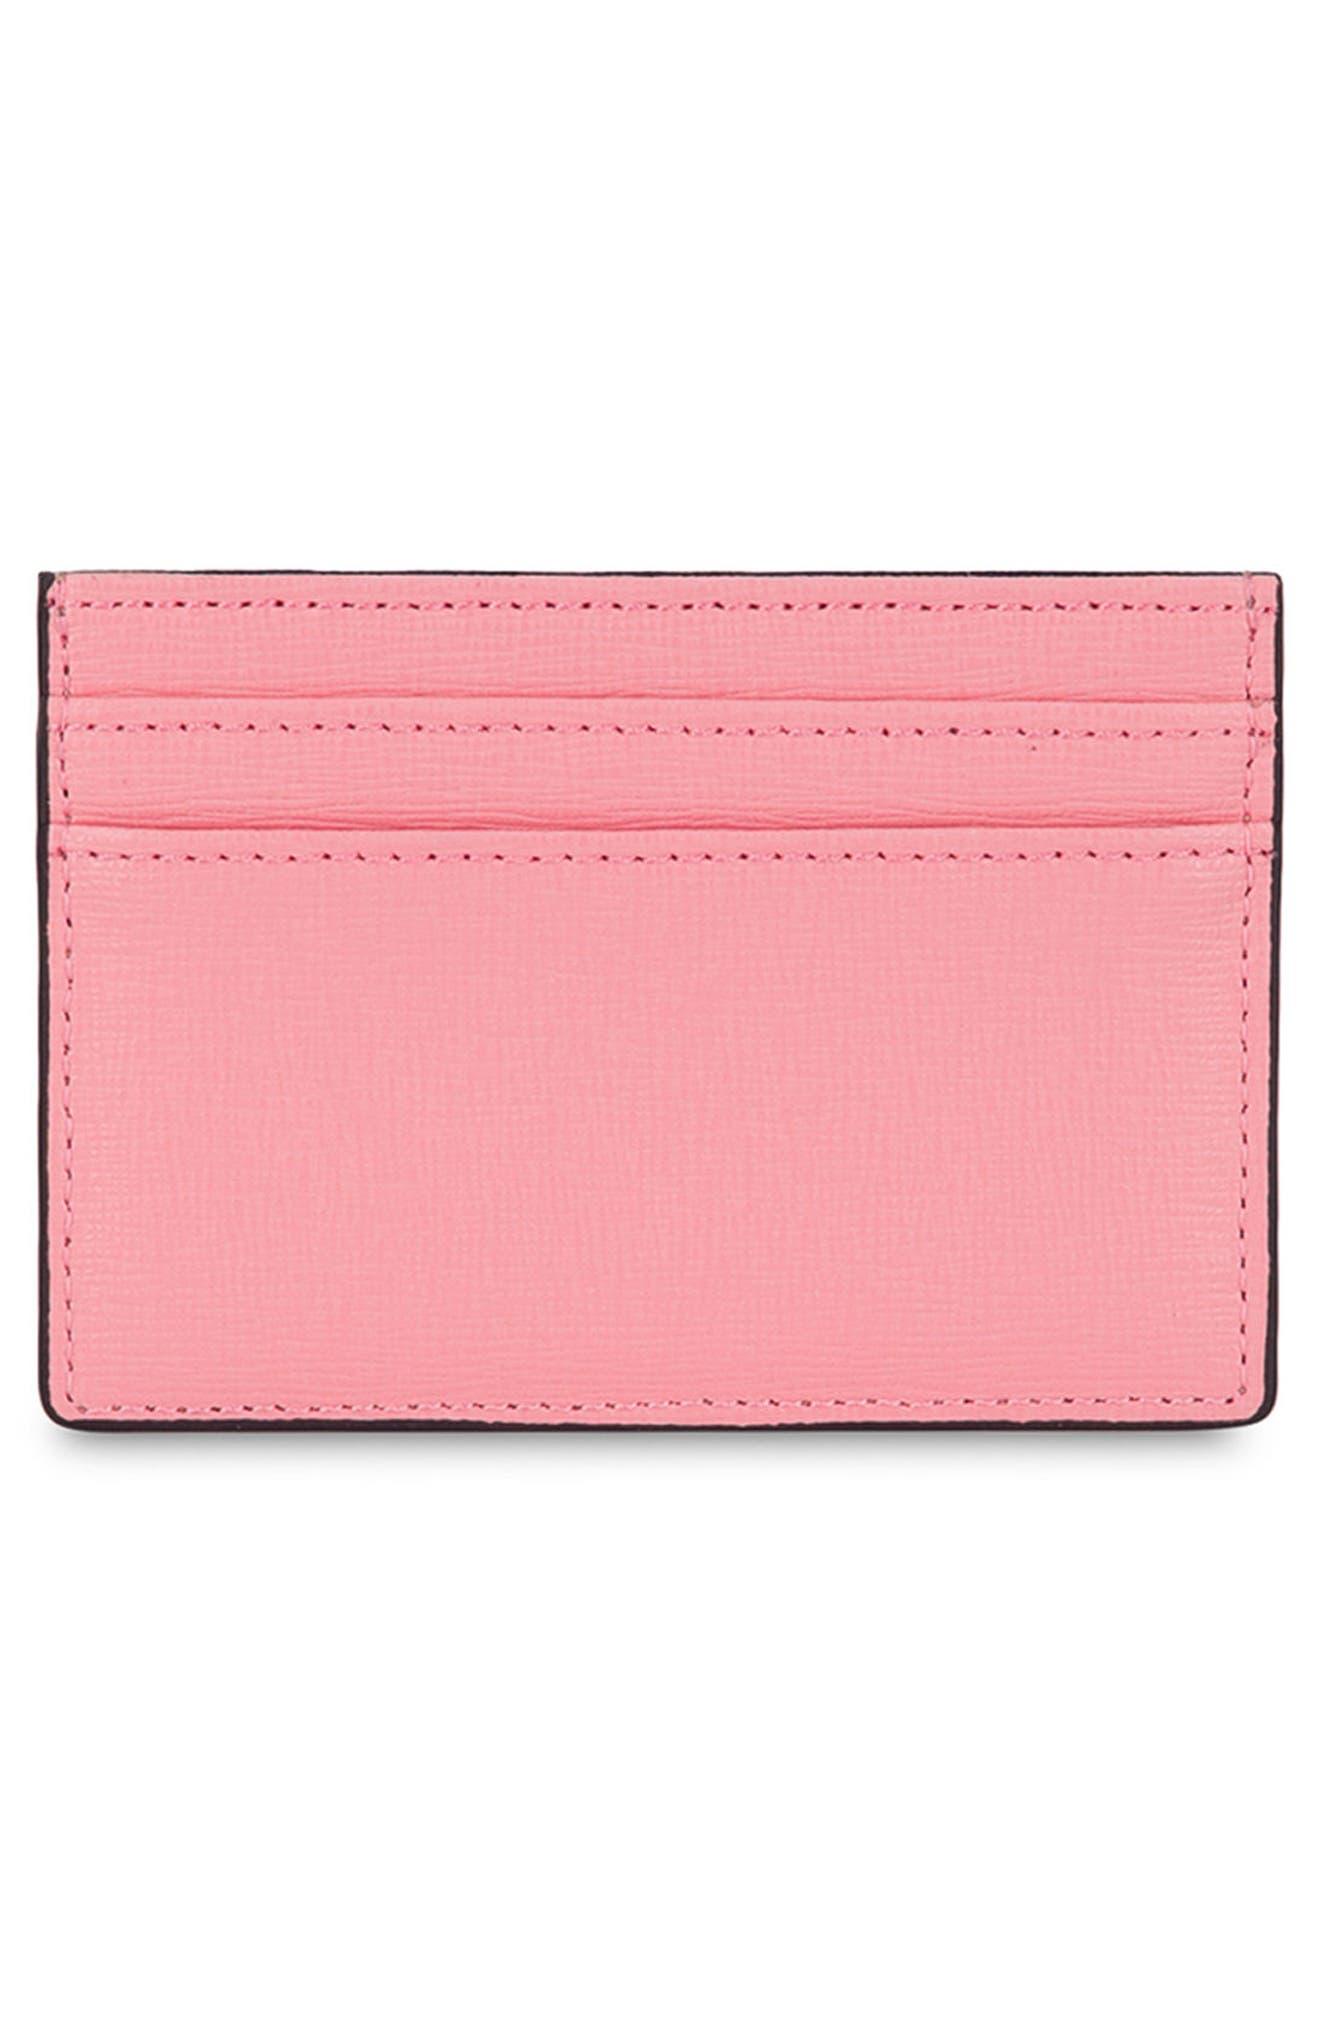 Babylon Saffiano Leather Card Case,                             Alternate thumbnail 7, color,